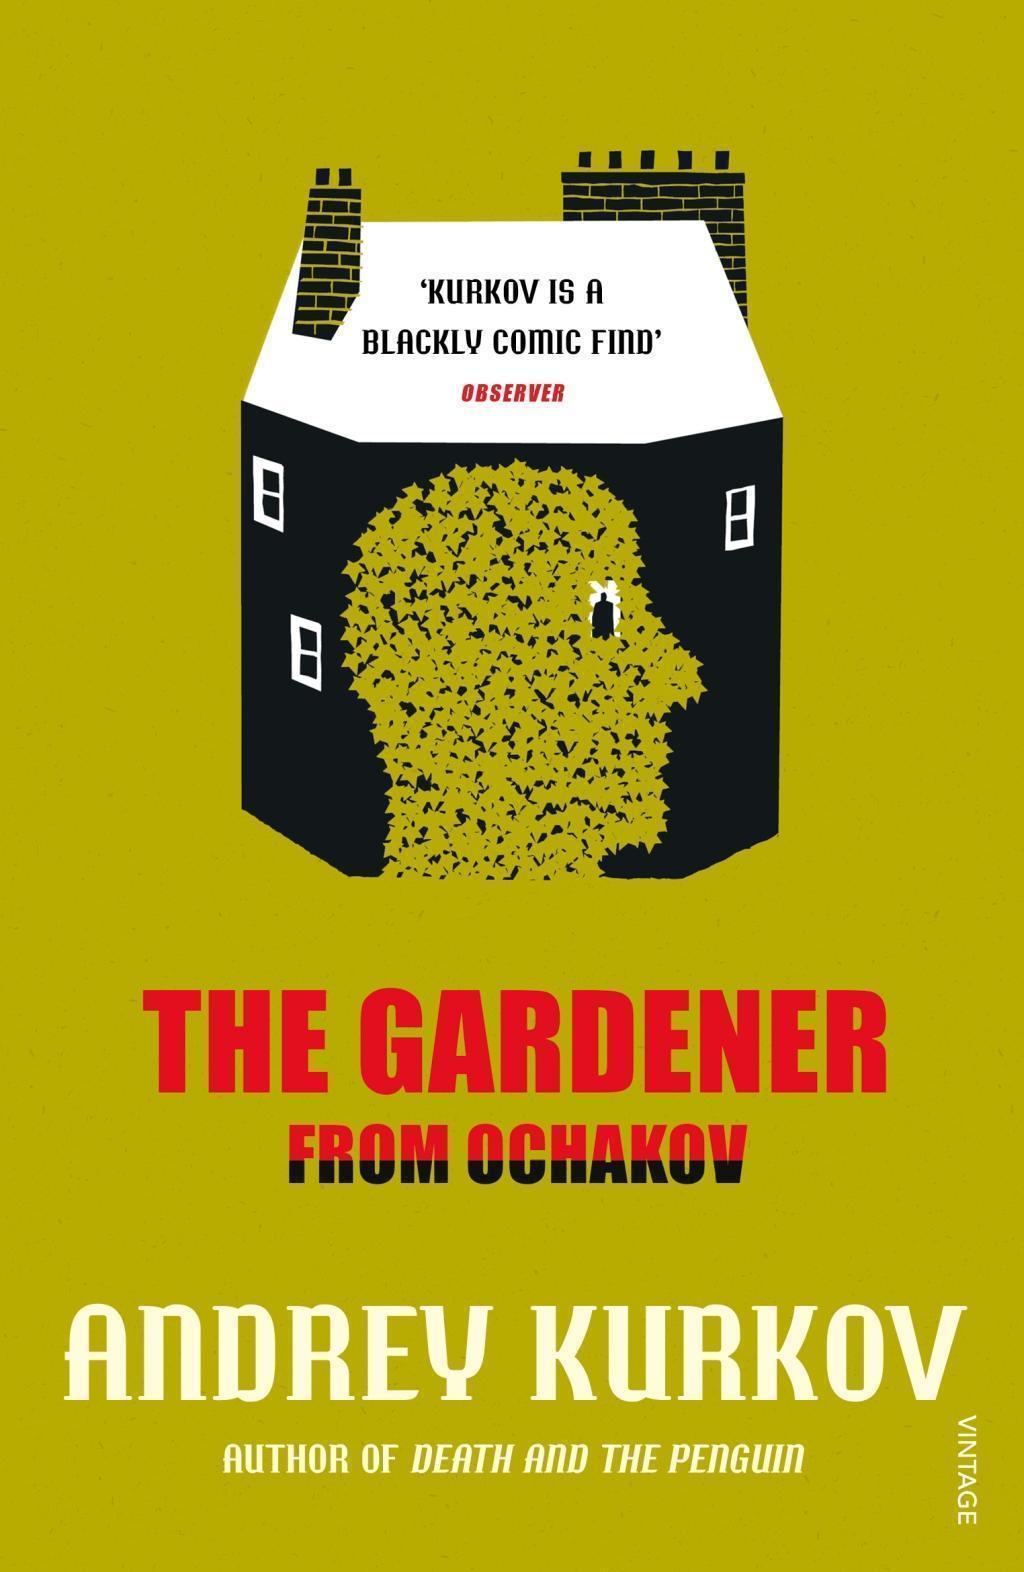 The Gardener from Ochakov